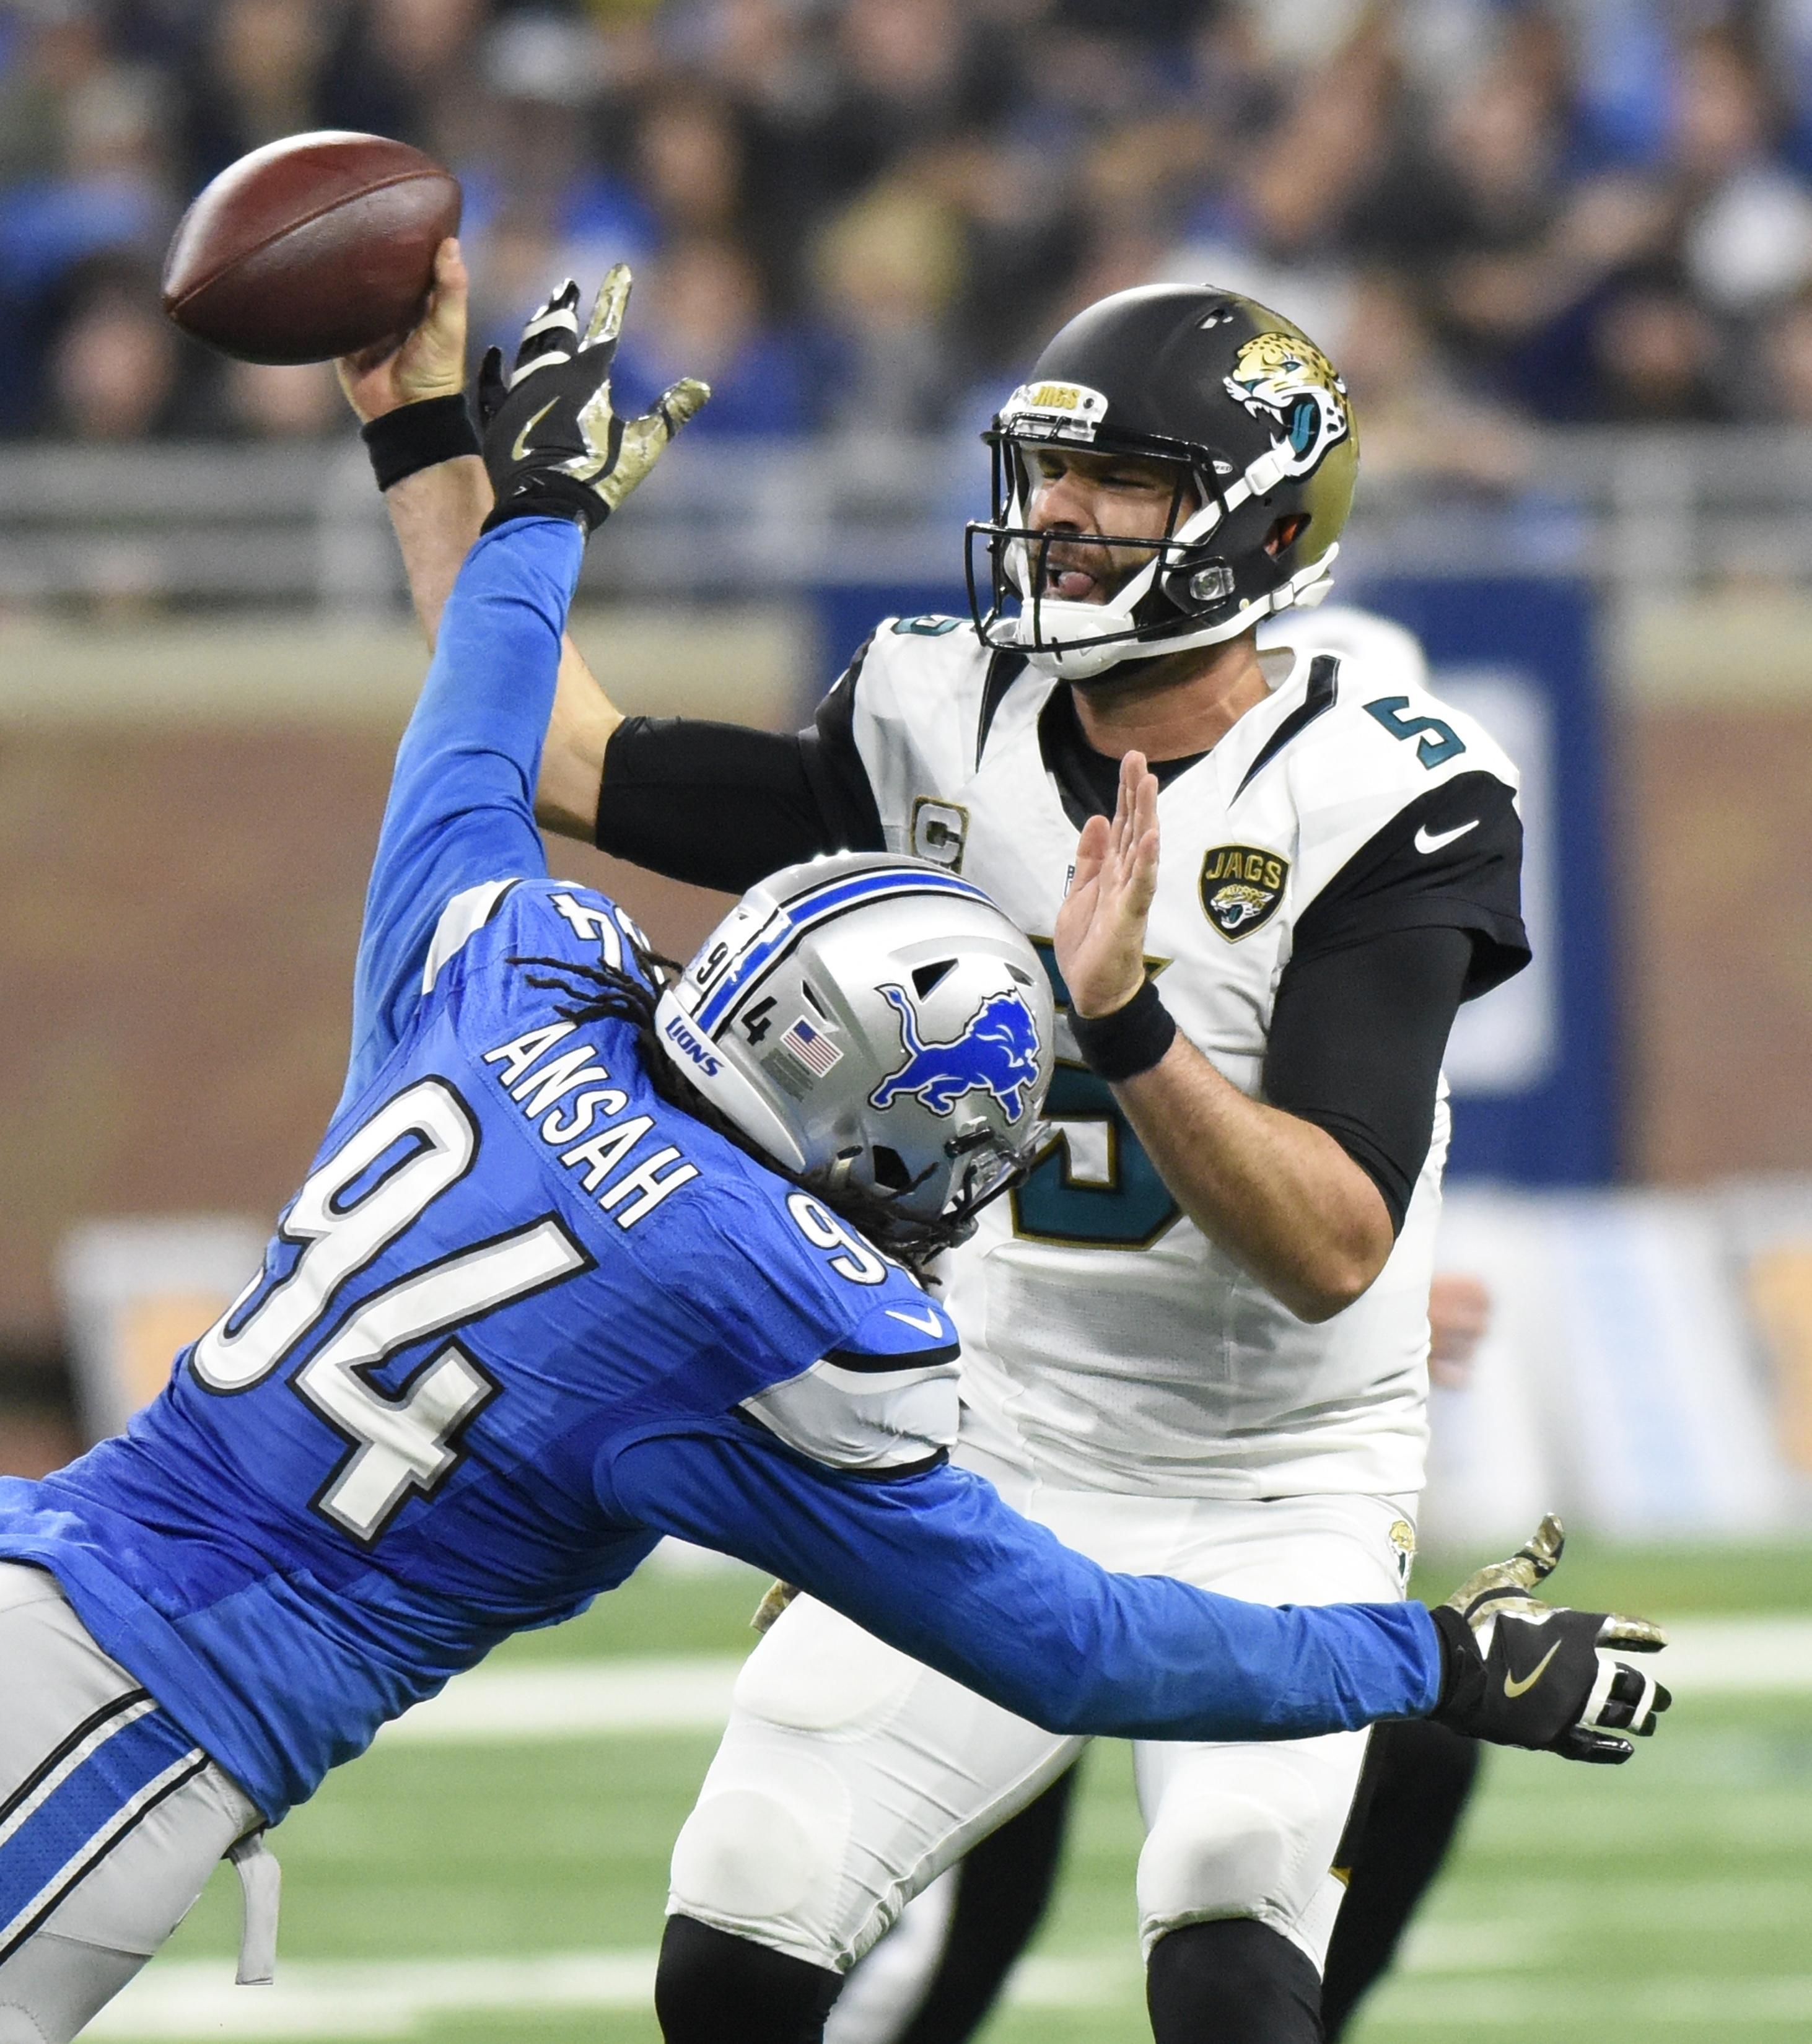 FILE - In this Nov. 20, 2016, file photo, Jacksonville Jaguars quarterback Blake Bortles (5) is rushed by Detroit Lions defensive end Ezekiel Ansah (94) during an NFL football game in Detroit. Jacksonville plays at the Buffalo Bills this week. (AP Photo/J